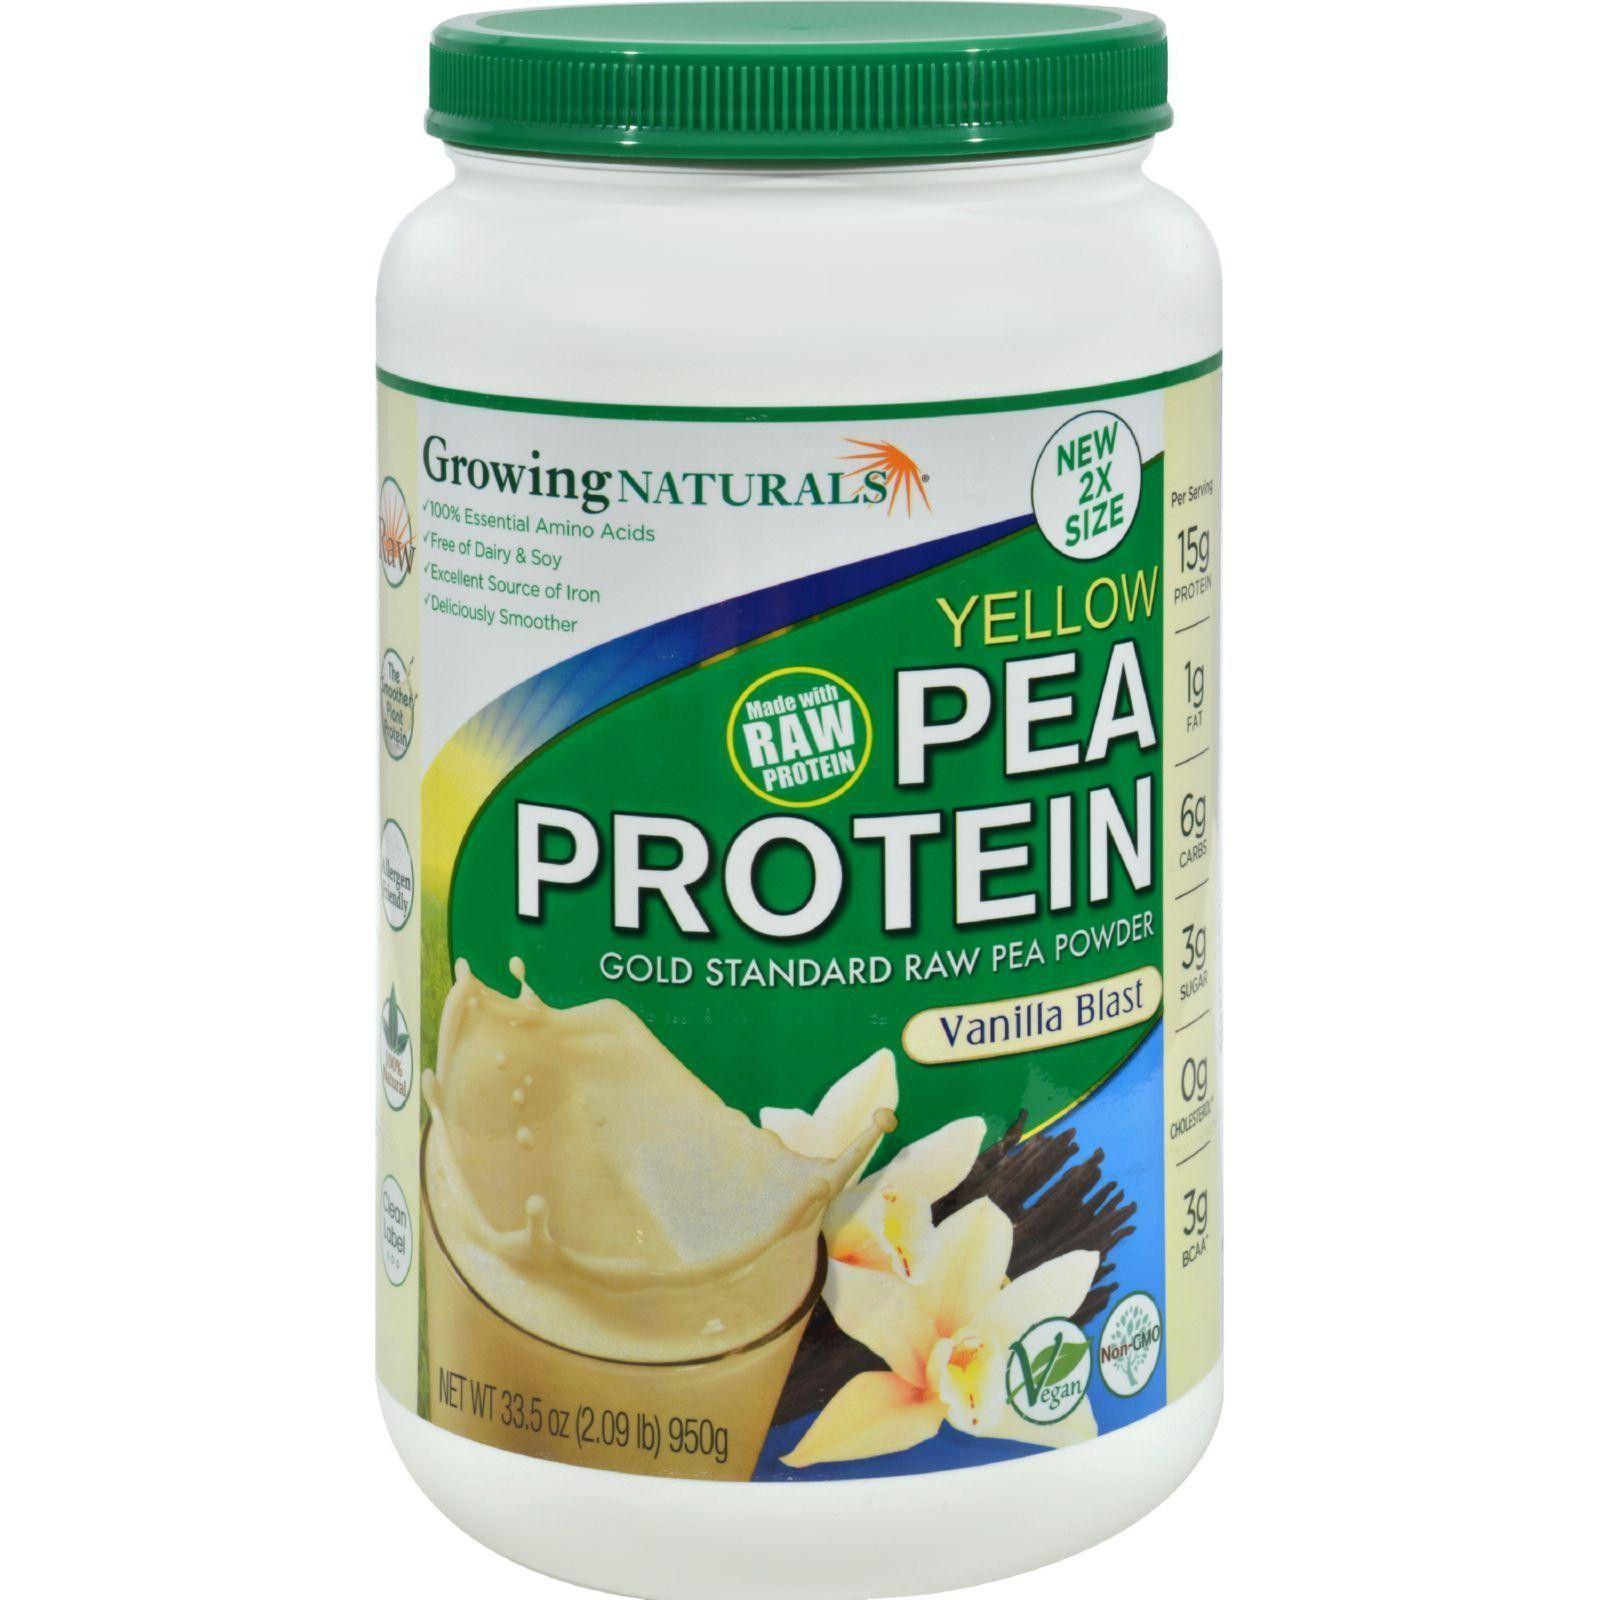 Growing Naturals Pea Protein Powder Vanilla Blast 33.5